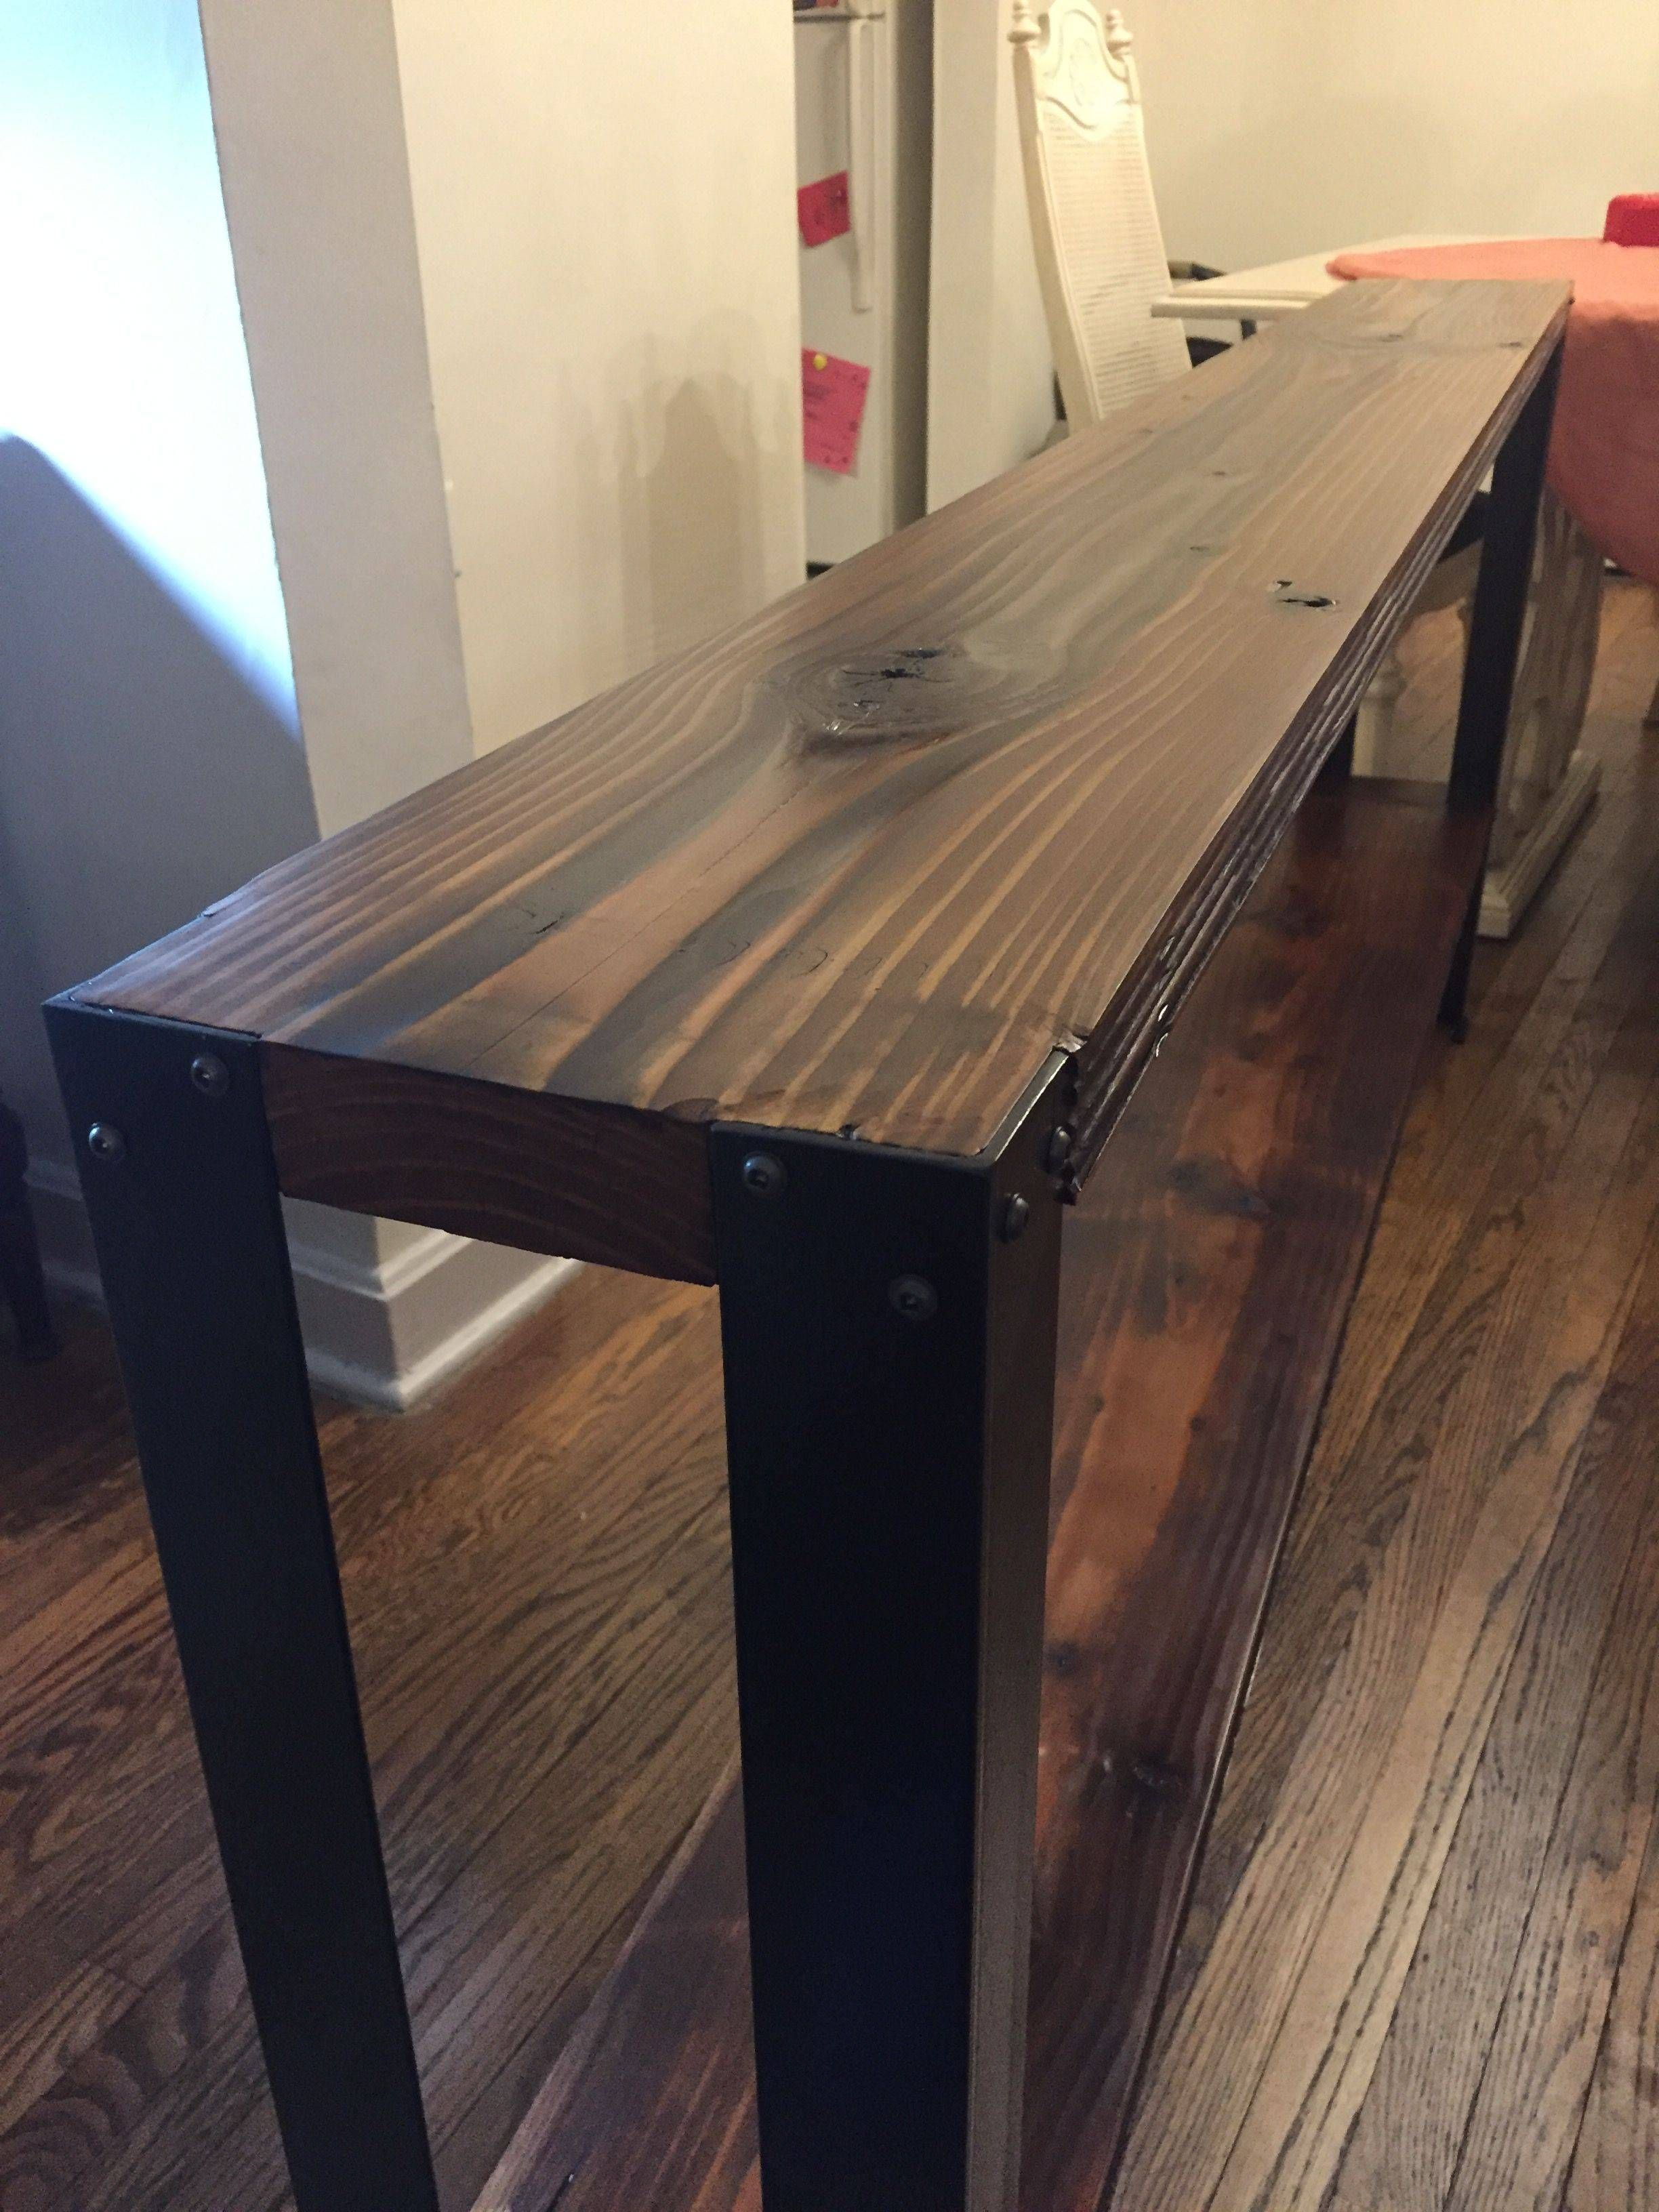 Inspirational Diy Table Legs Ideas Buildingdesign Homedesign Architecture Home Design Housedesignidea Pr In 2020 Wood Sofa Table Rustic Sofa Tables Rustic Sofa